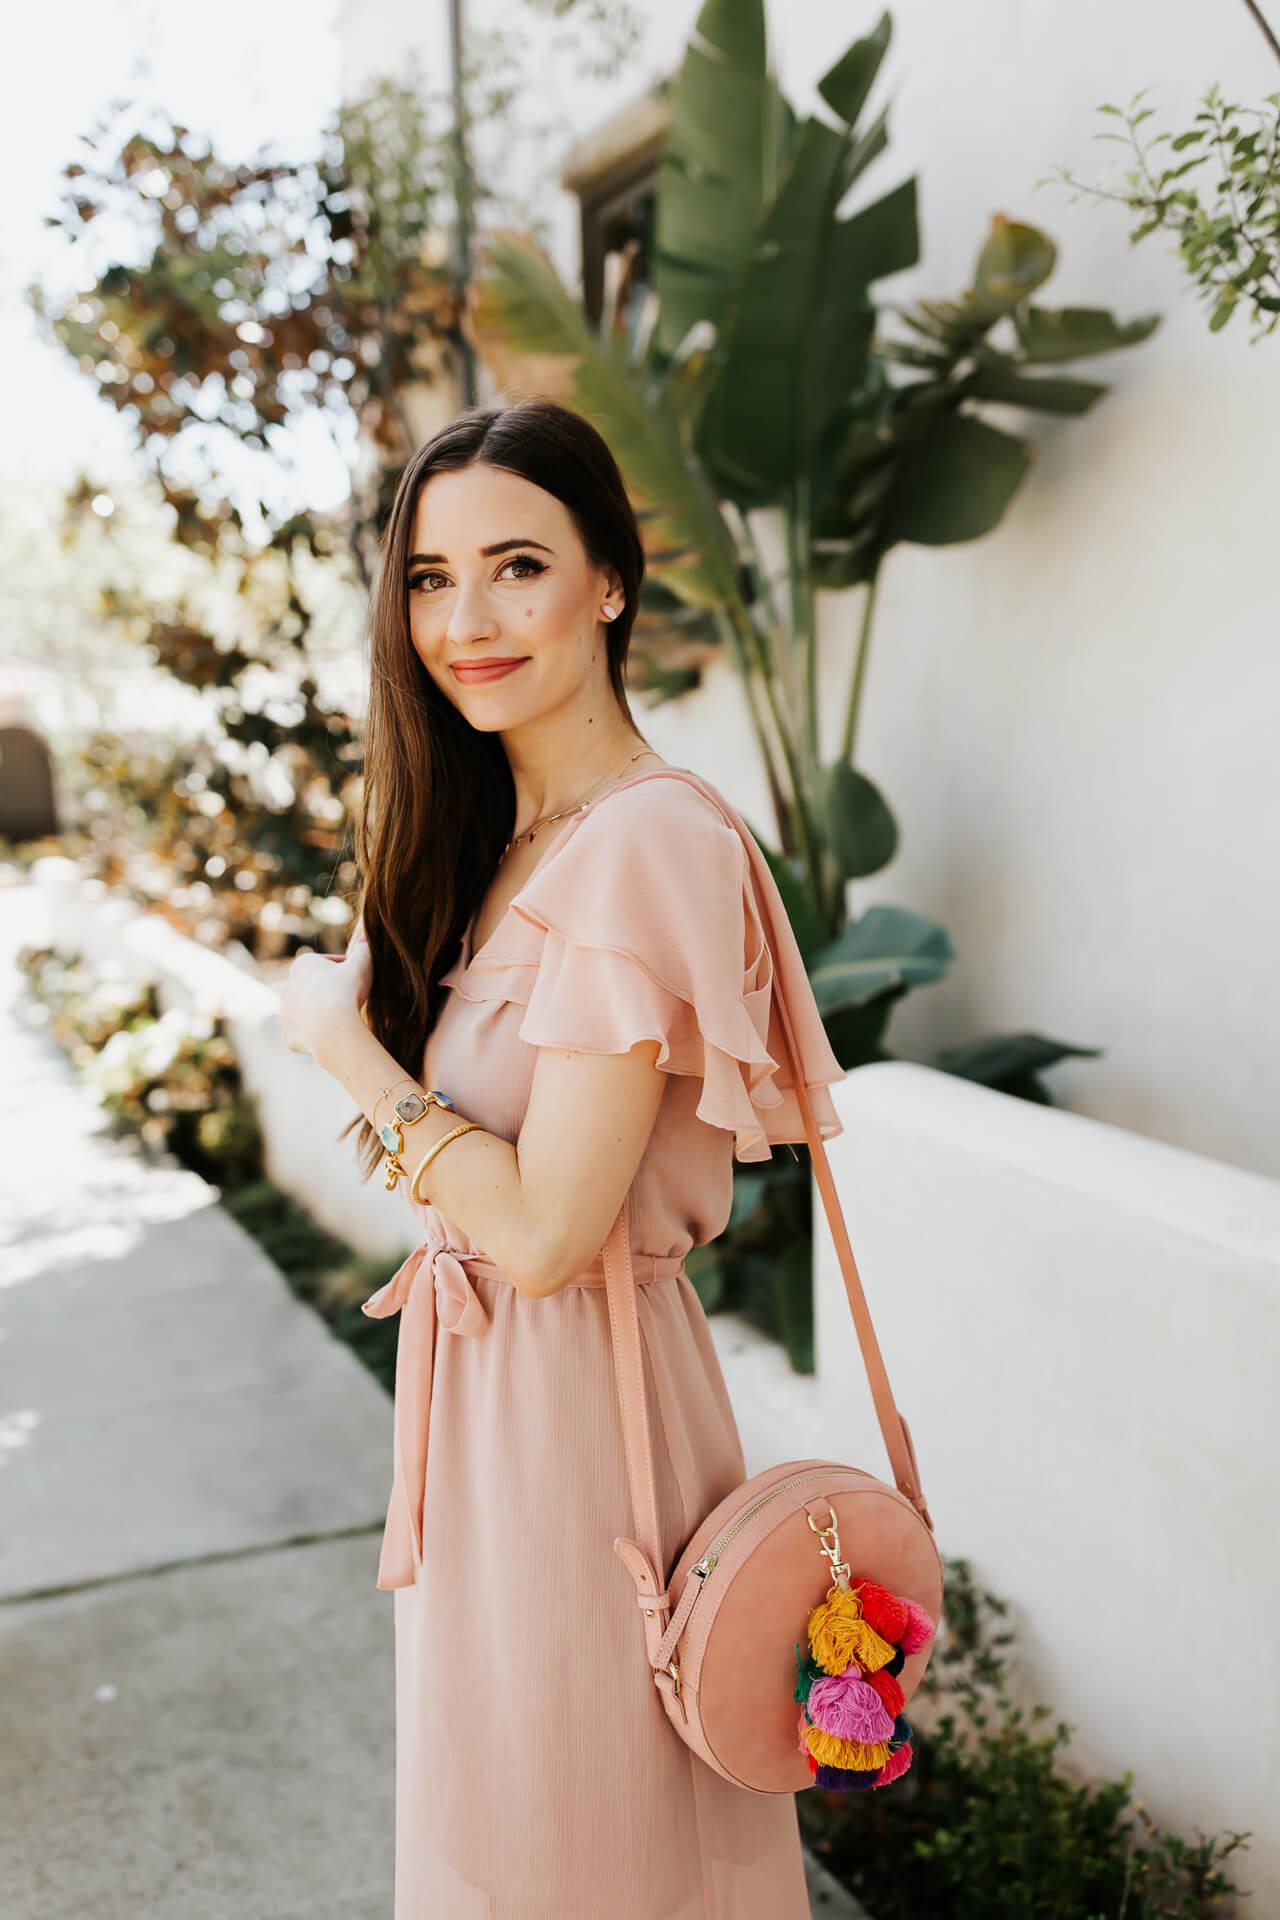 ruffled sleeves on pretty pink dress - feminine fashion blogger M Loves M @marmar